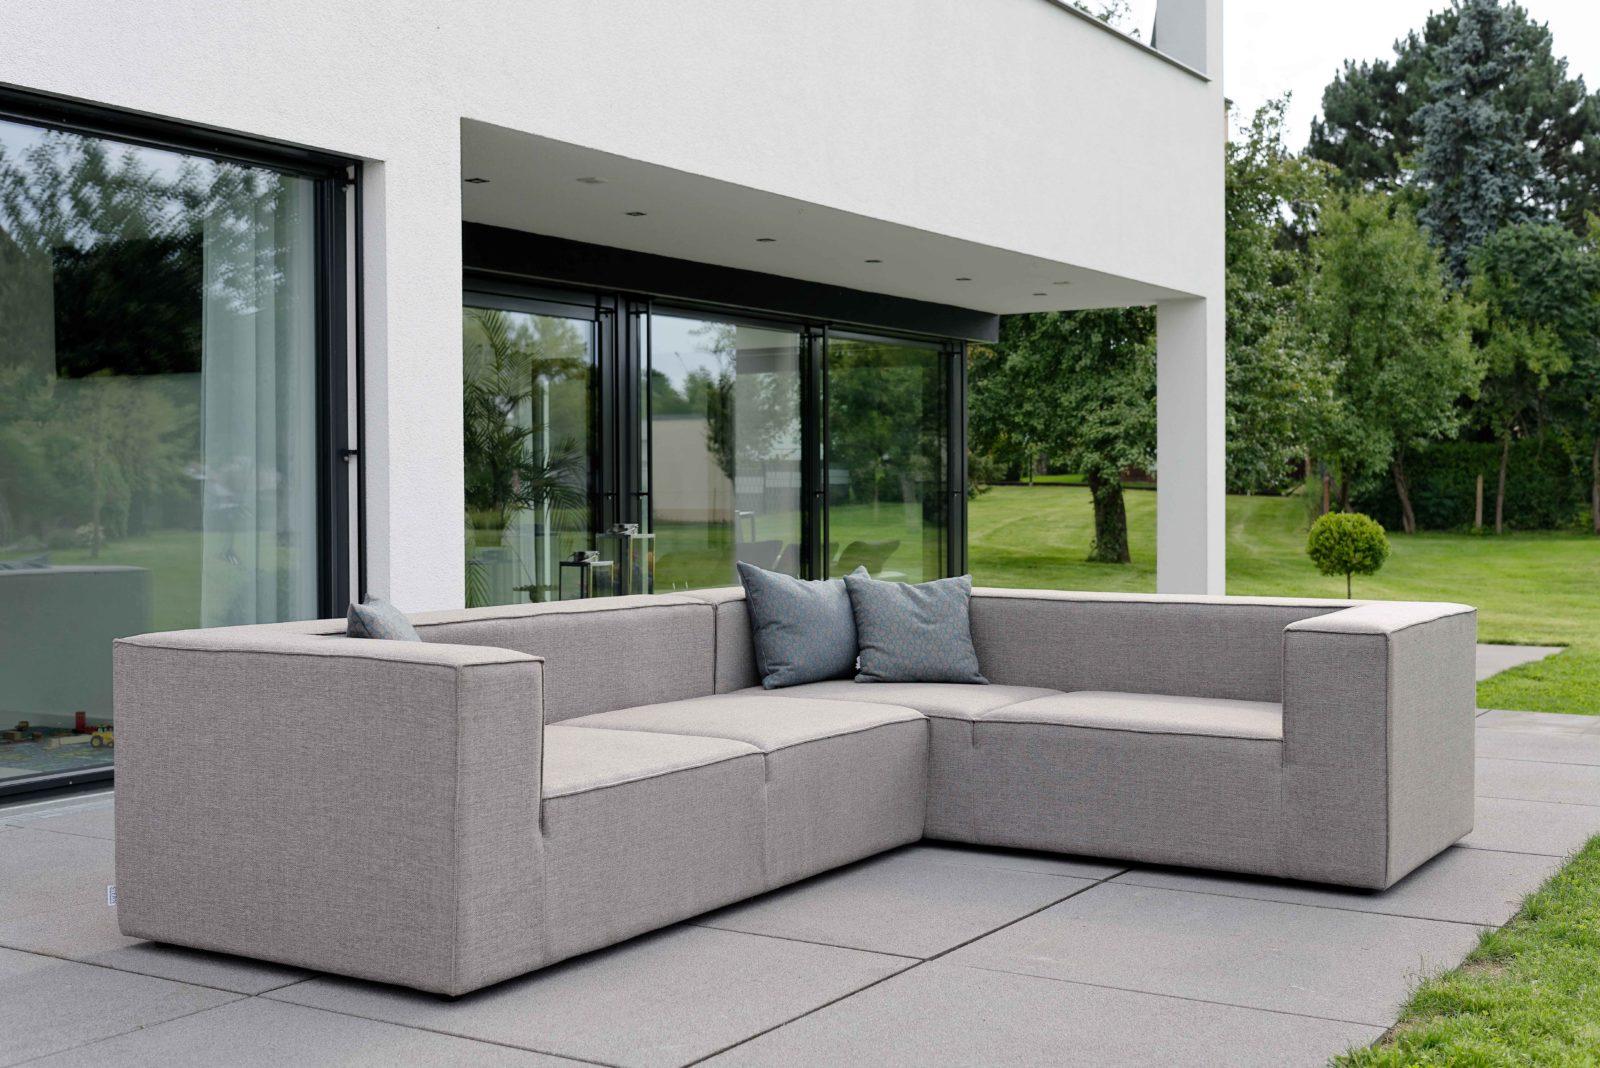 Modern Aluminum Outdoor Sectional Sofa Patio Backyard ...